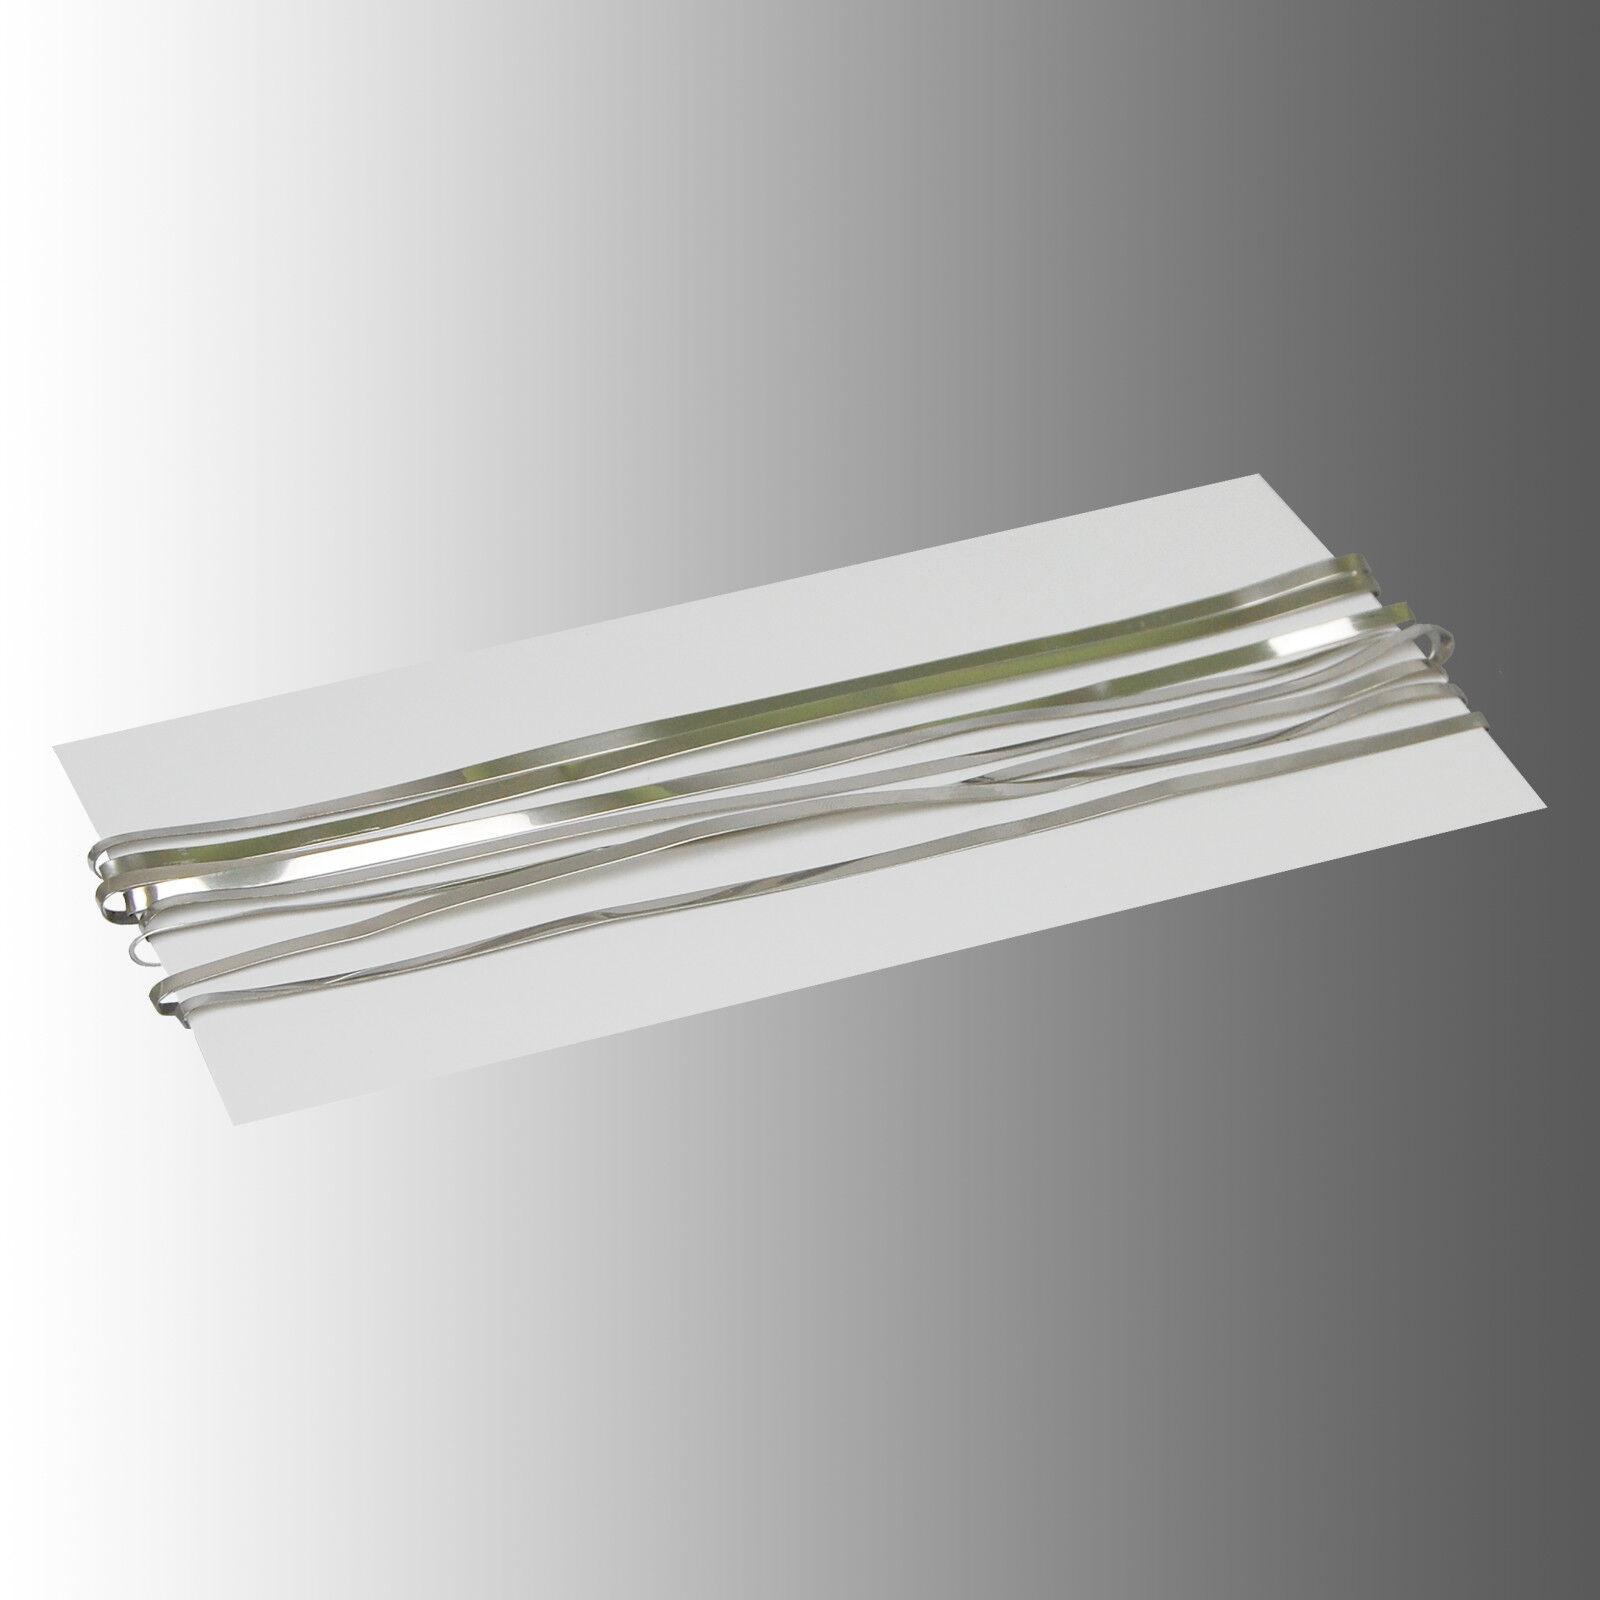 5 Meter 7mm x 0.15mm />99,5/% Nickelband Akkuverbinder Lötfahnen Hiluminband